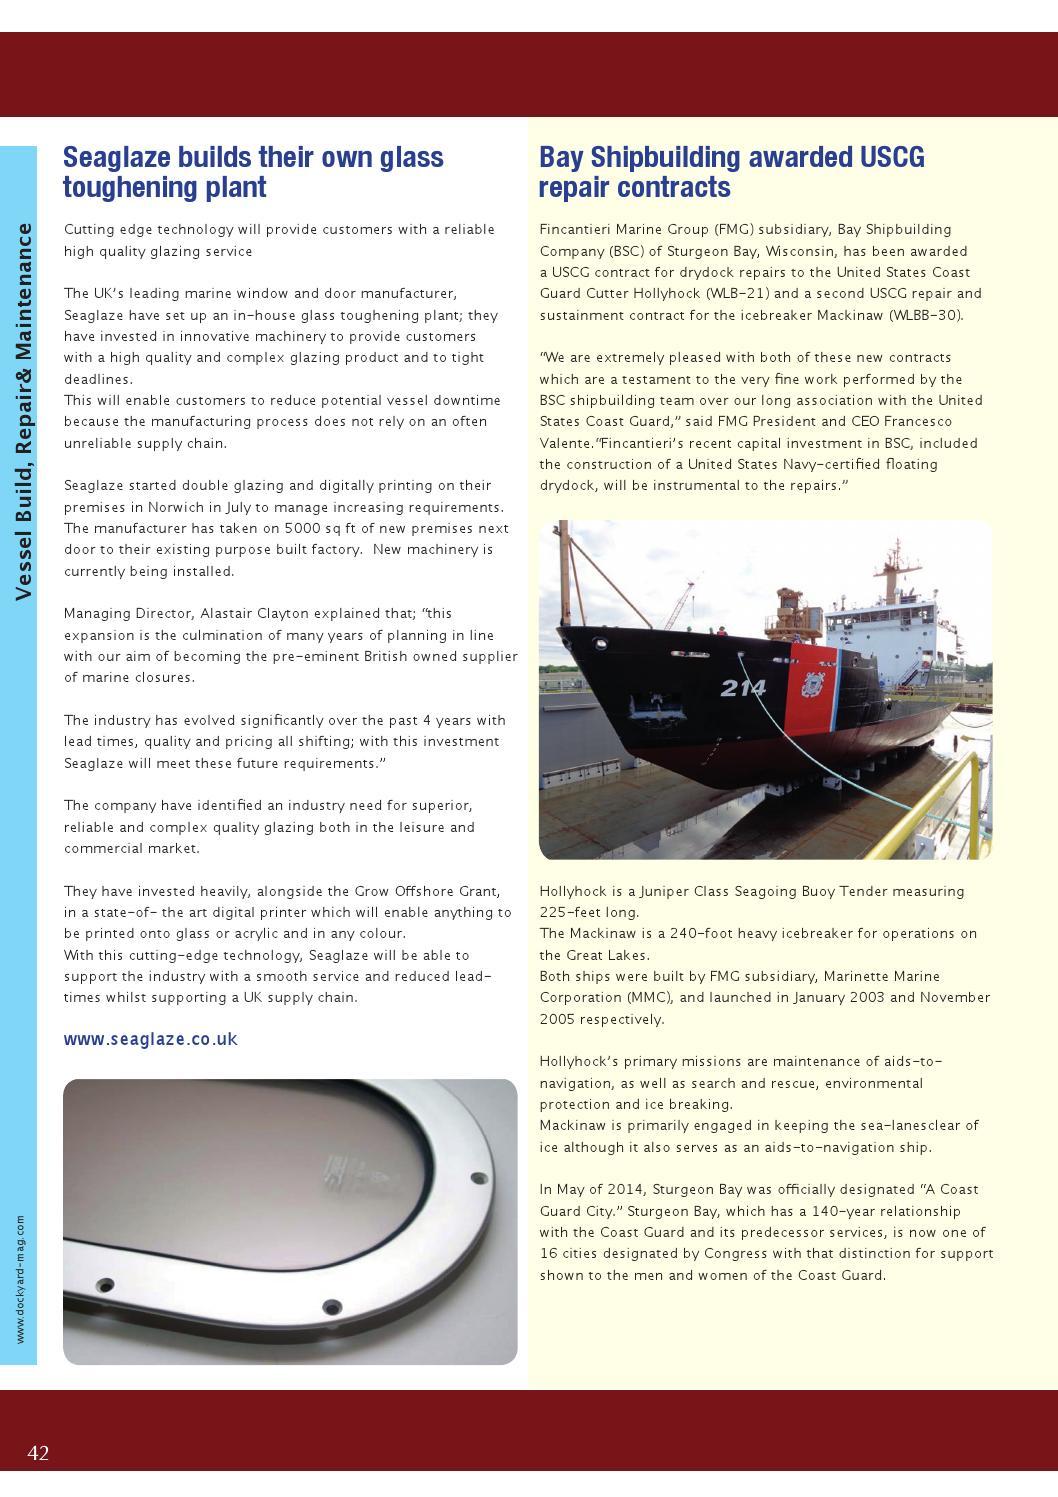 Dockyard Magazine August 14 Issue By Dockyard Magazine